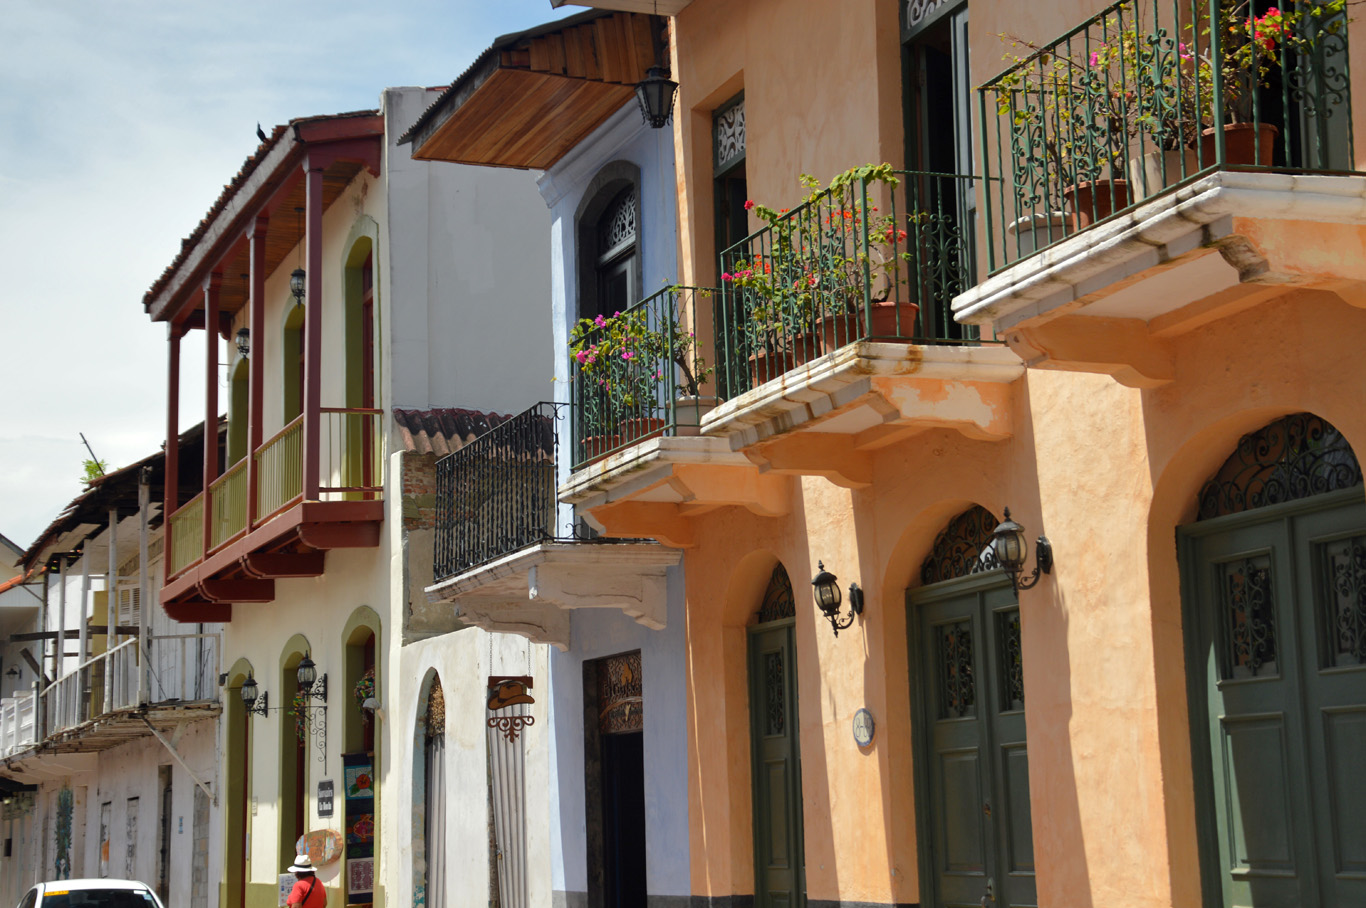 Beautiful houses in Casco Viejo